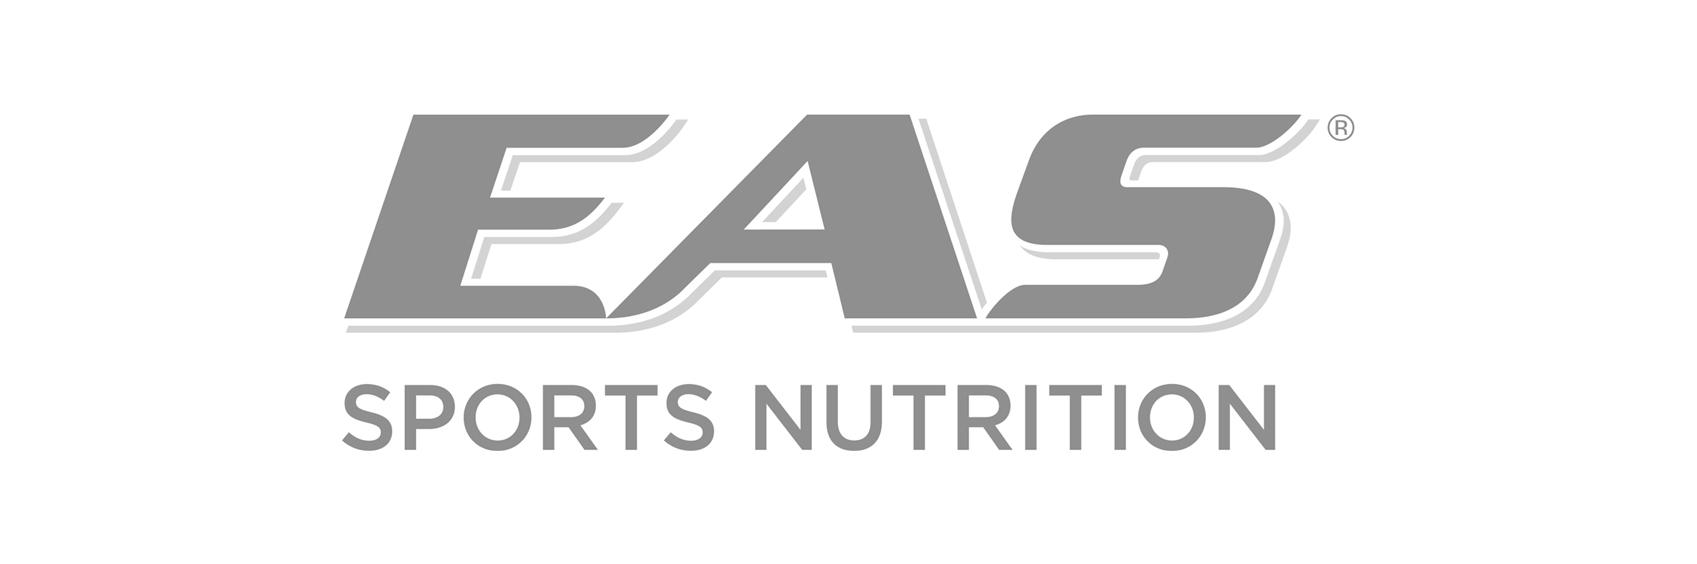 EAS_SportsNutrition_black.jpg